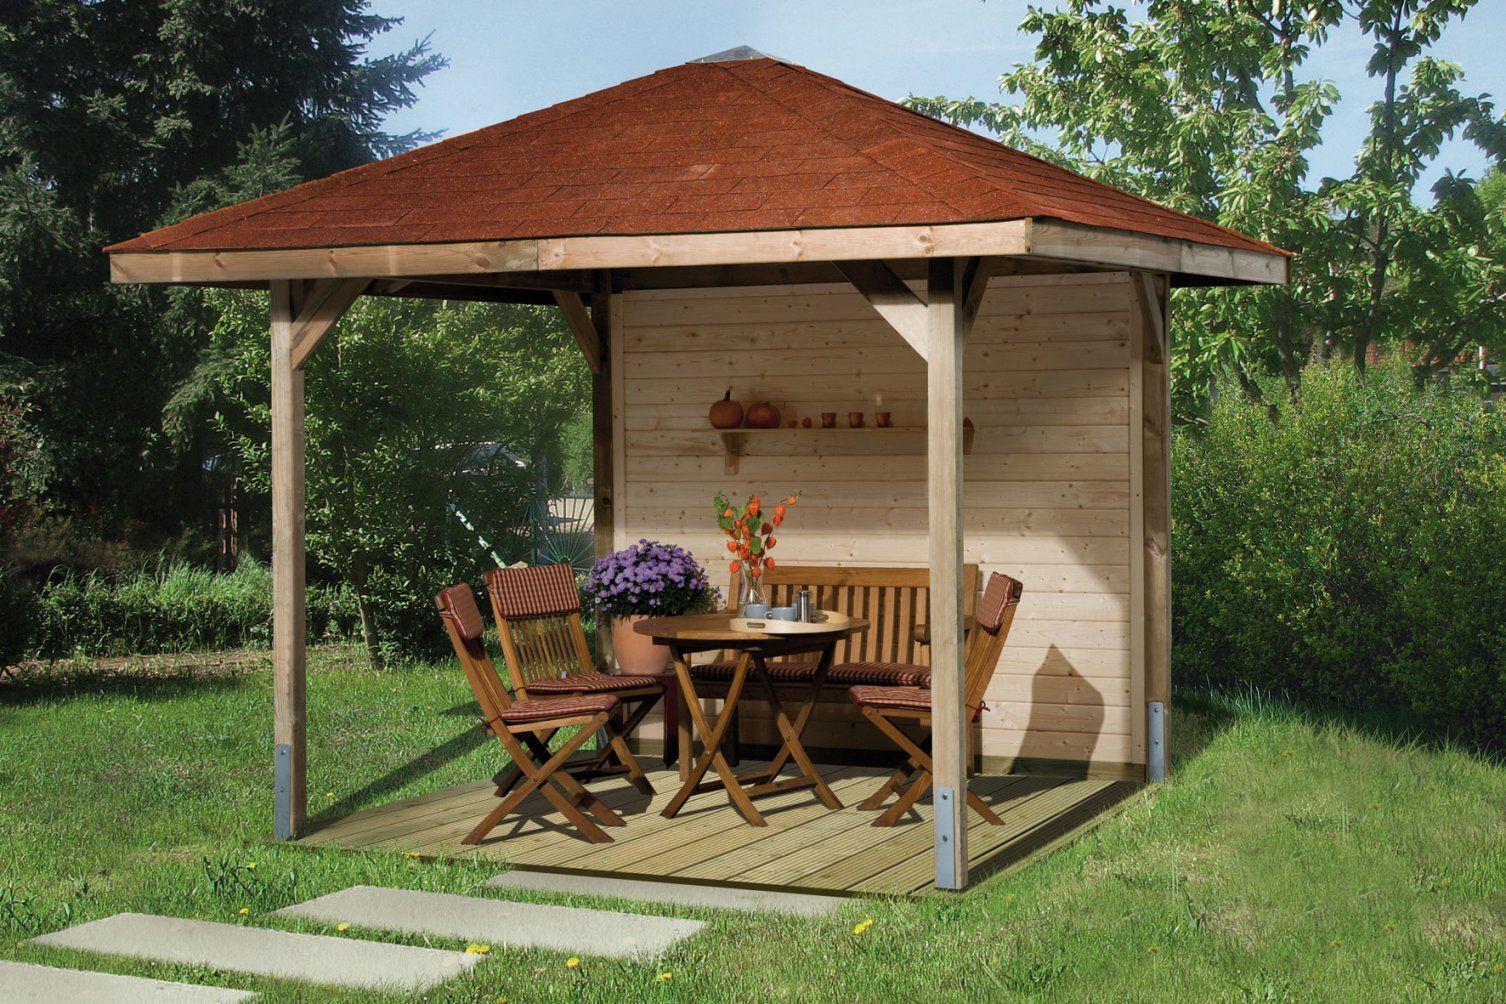 Holz Pavillon Fabulous Holz Pavillon Garten Fi Hitoiro Garten With von Pavillon 6 Eckig Holz Bild